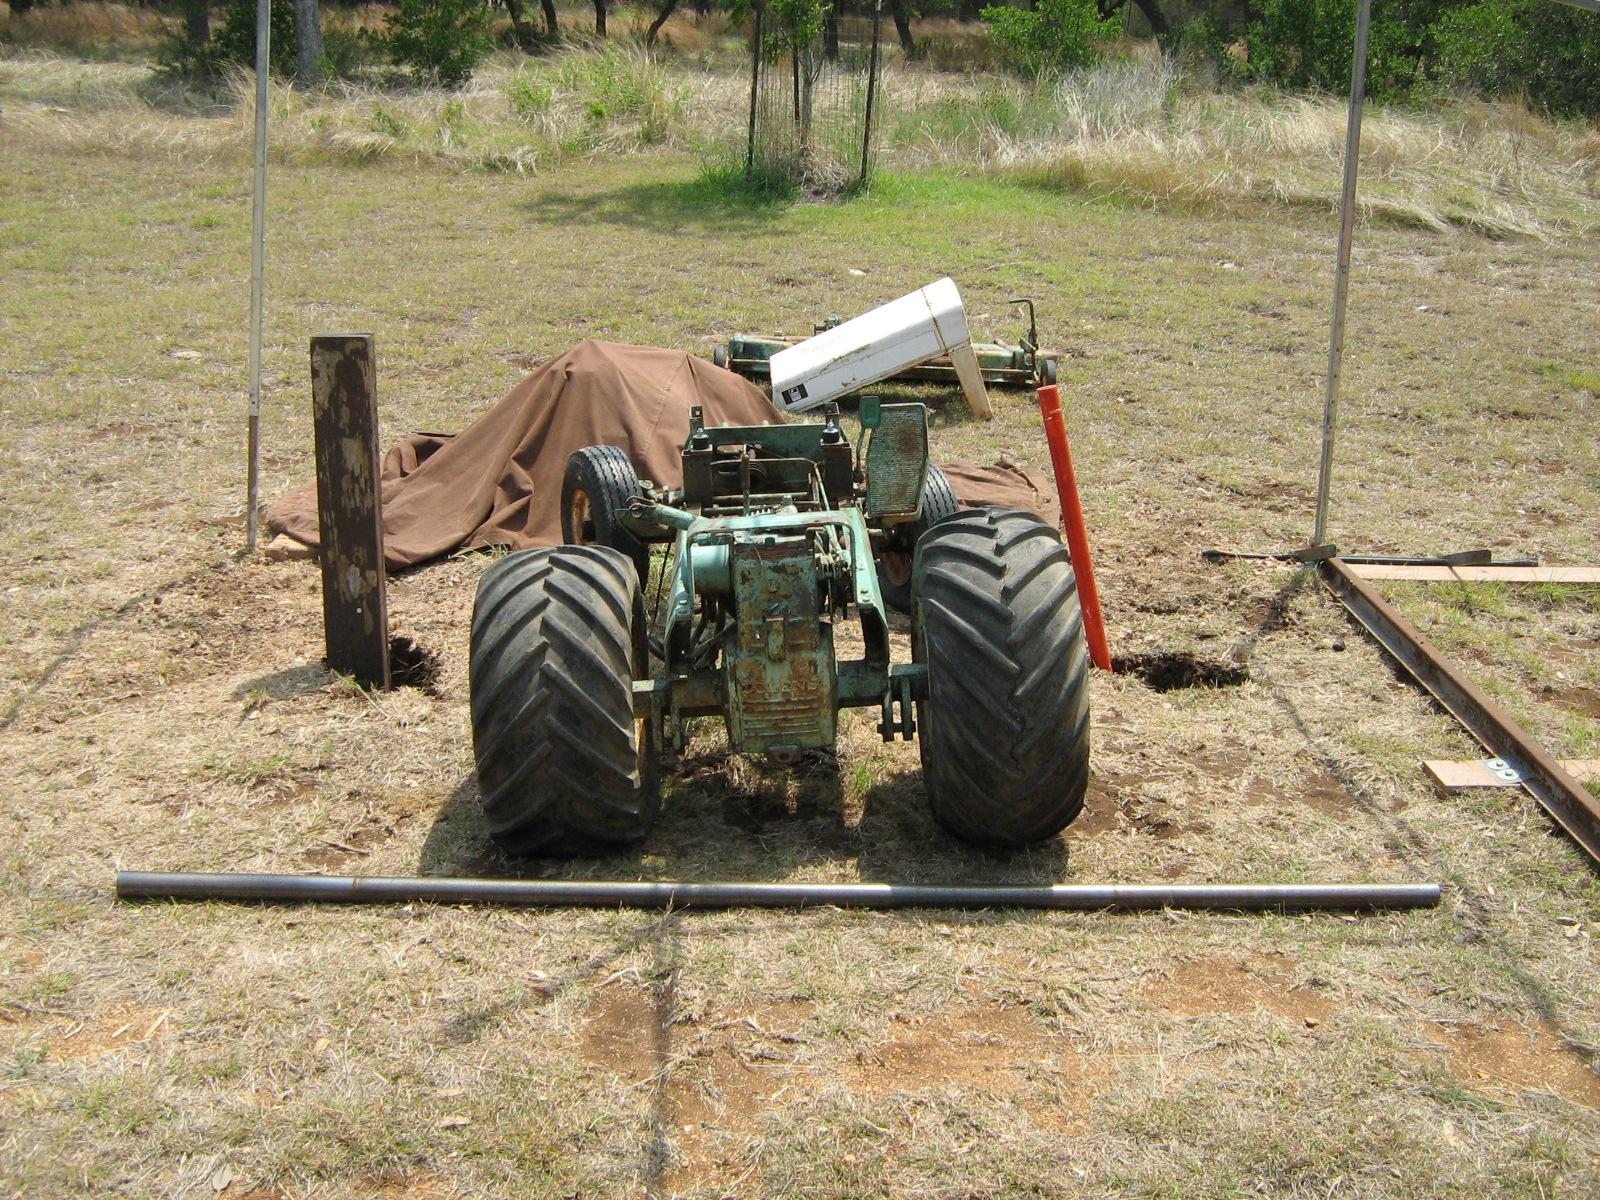 RPI projects: Hoist Under Construction